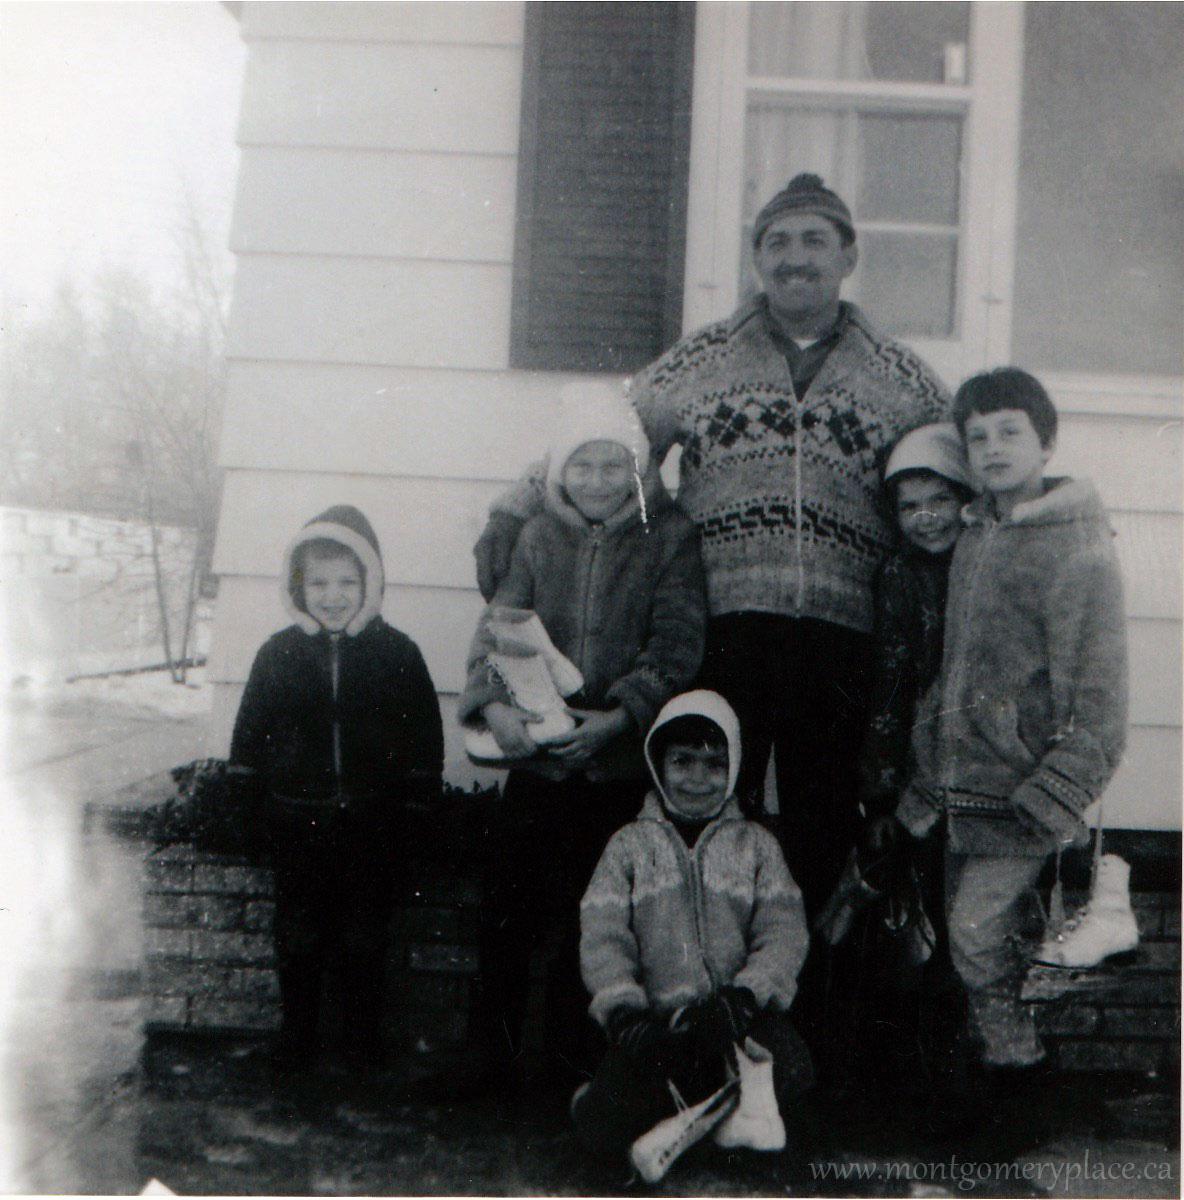 Genereux-Skating-1965-Montgomery